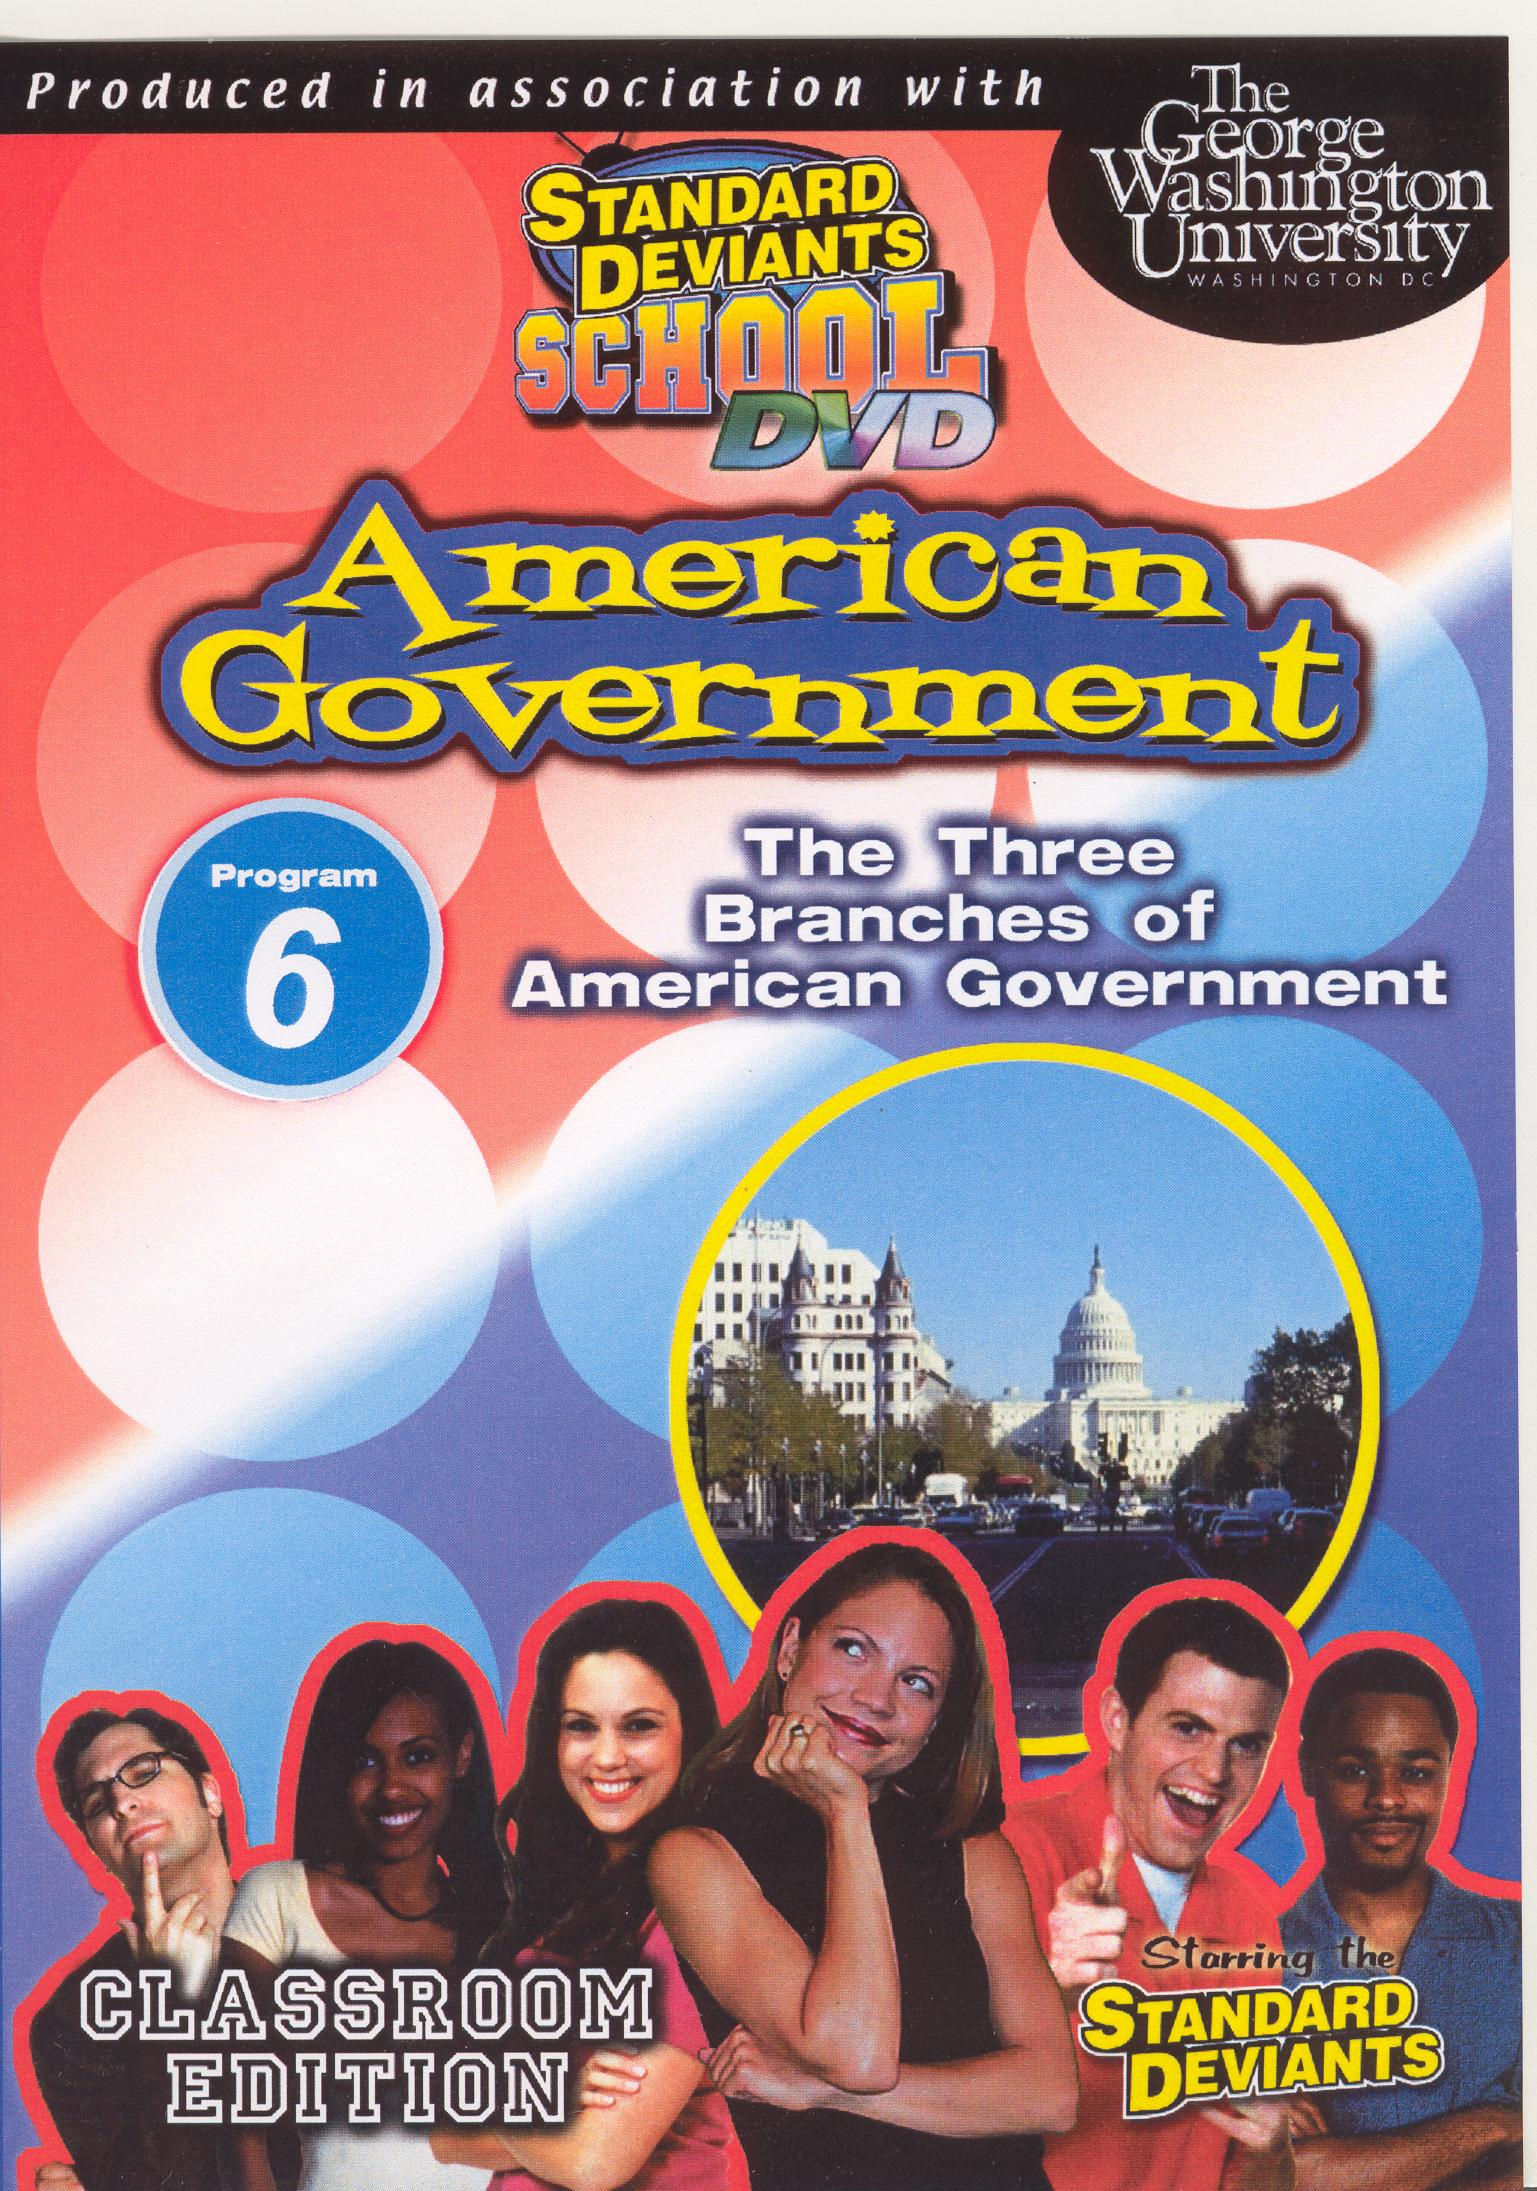 Standard Deviants School: American Government, Module 6 - The Three Branches of American Government